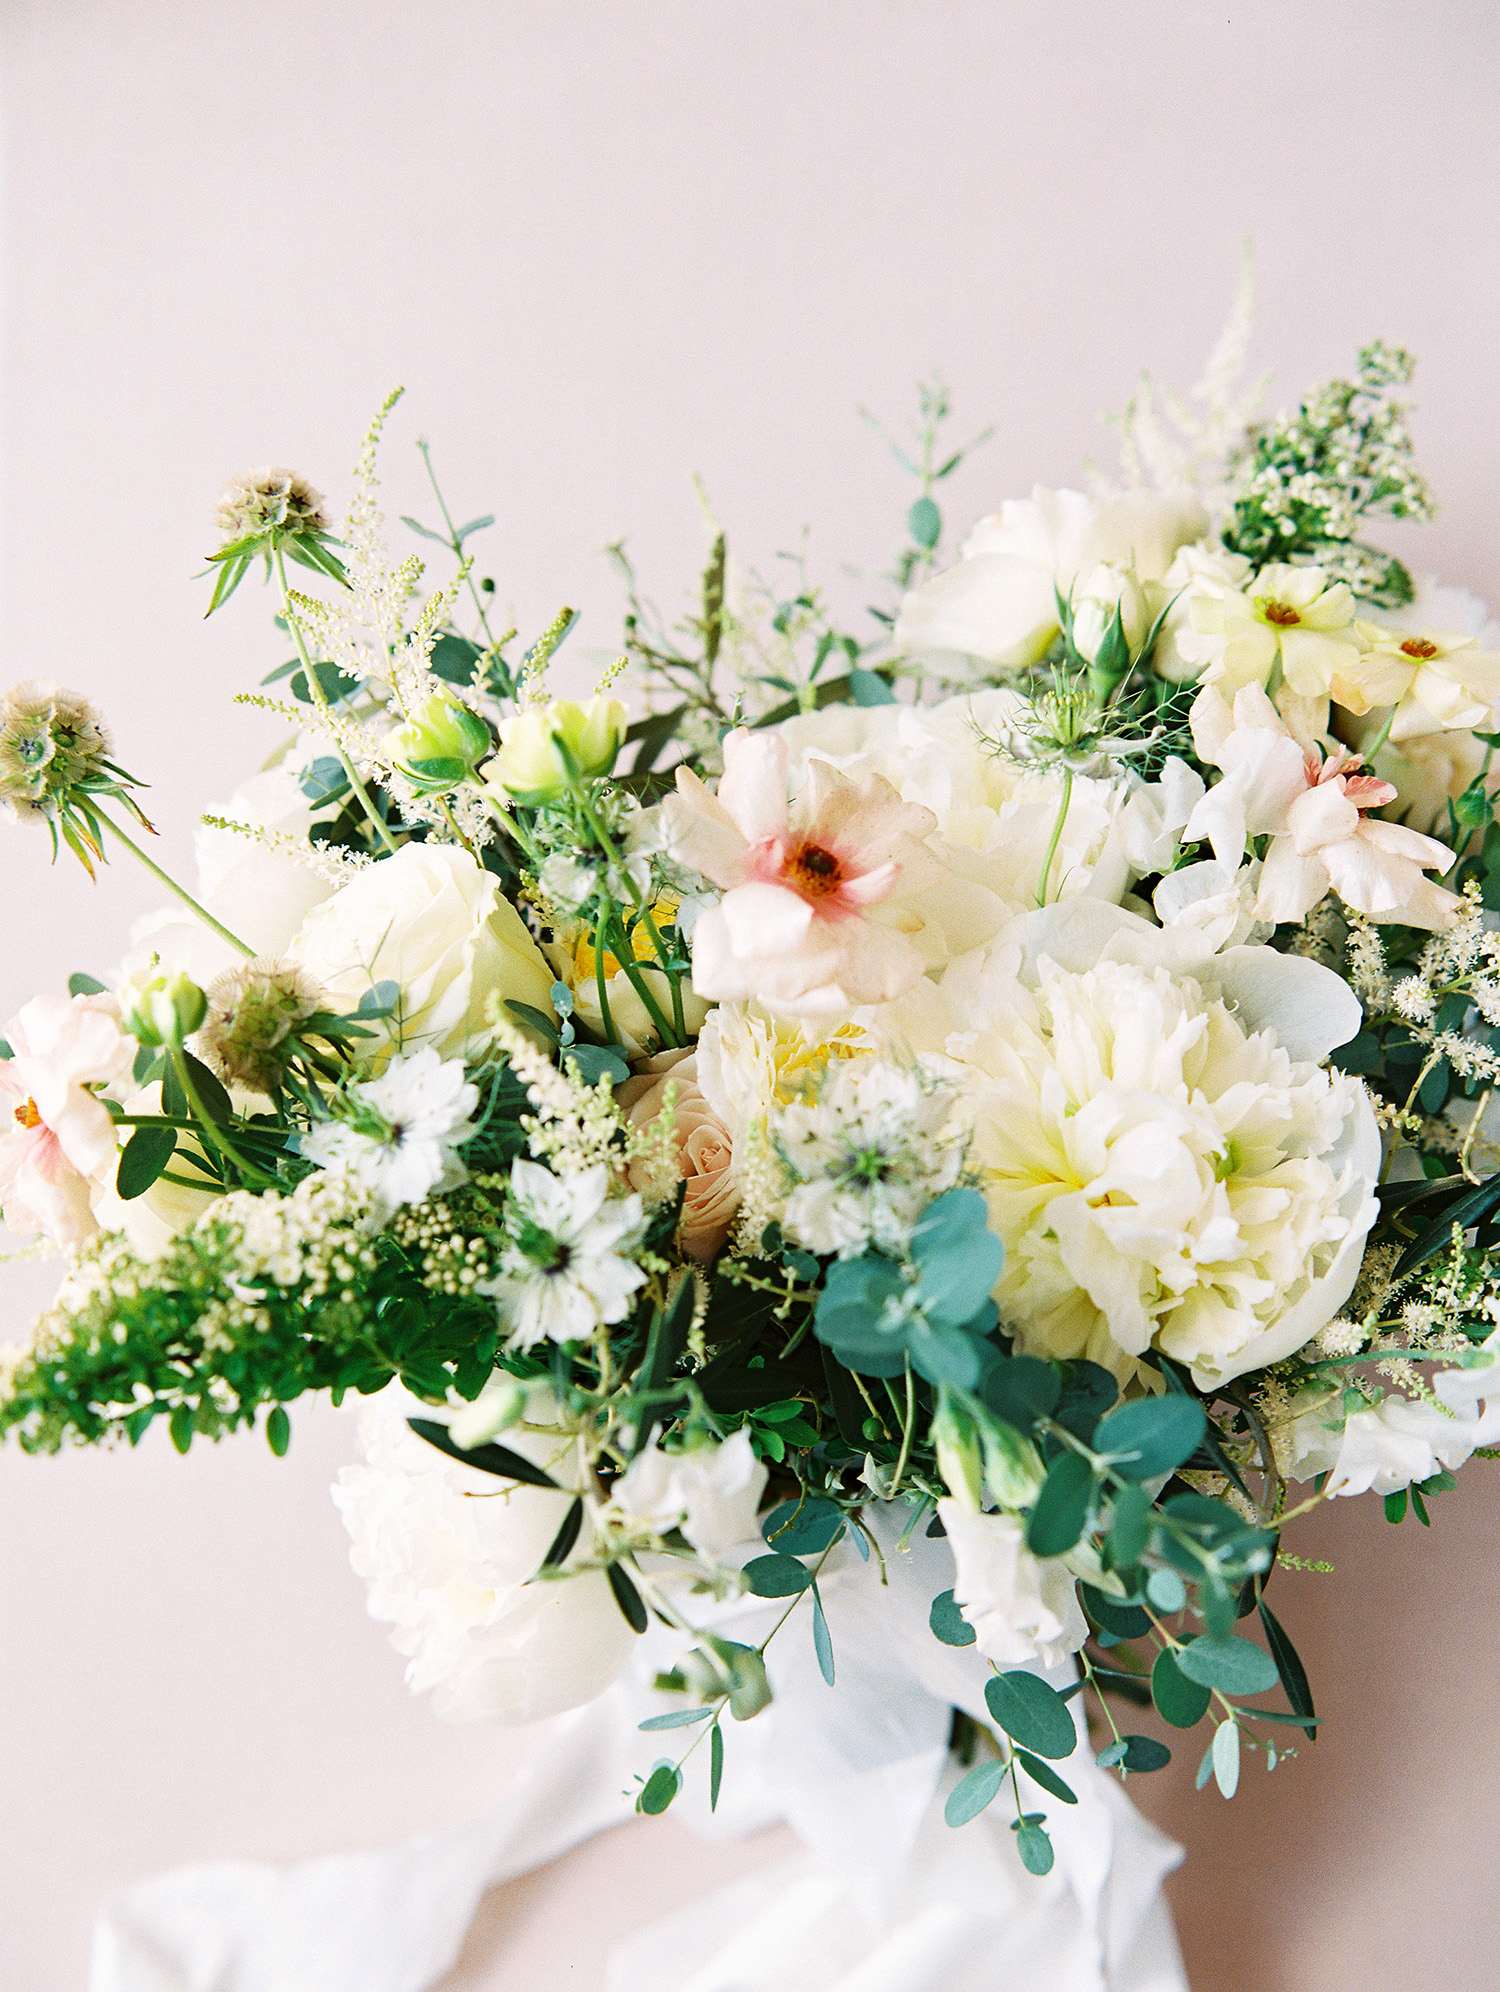 kati erik wedding bouquet flowers